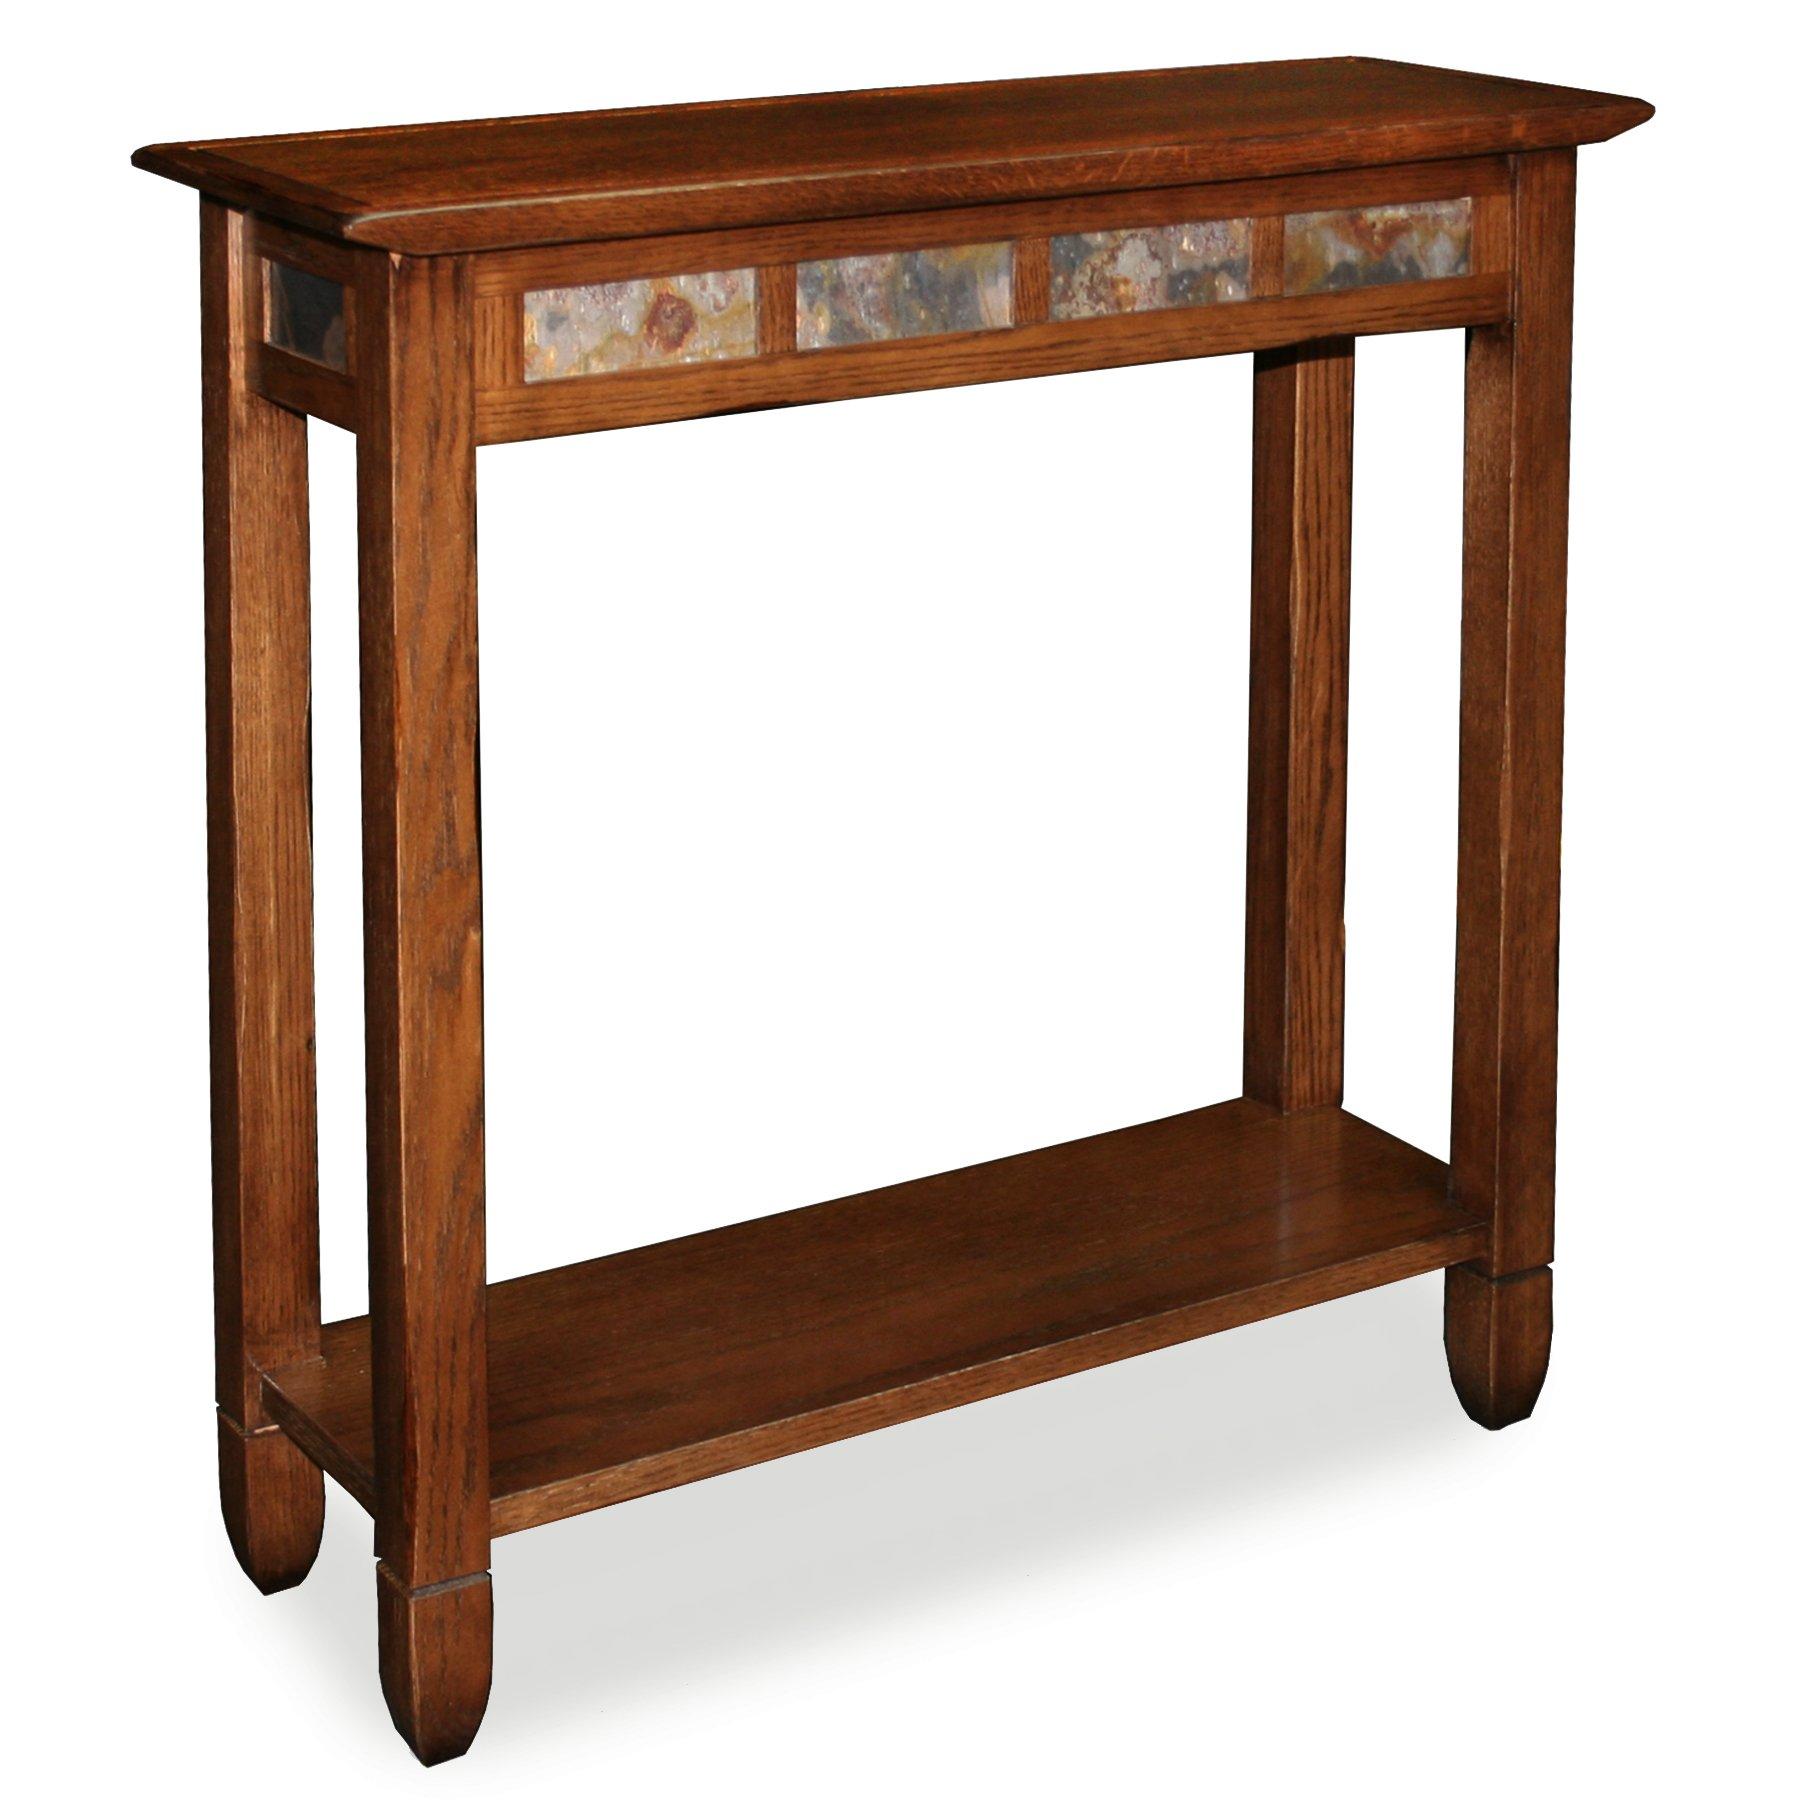 Rustic Slate Hall Stand - Rustic Oak Finish